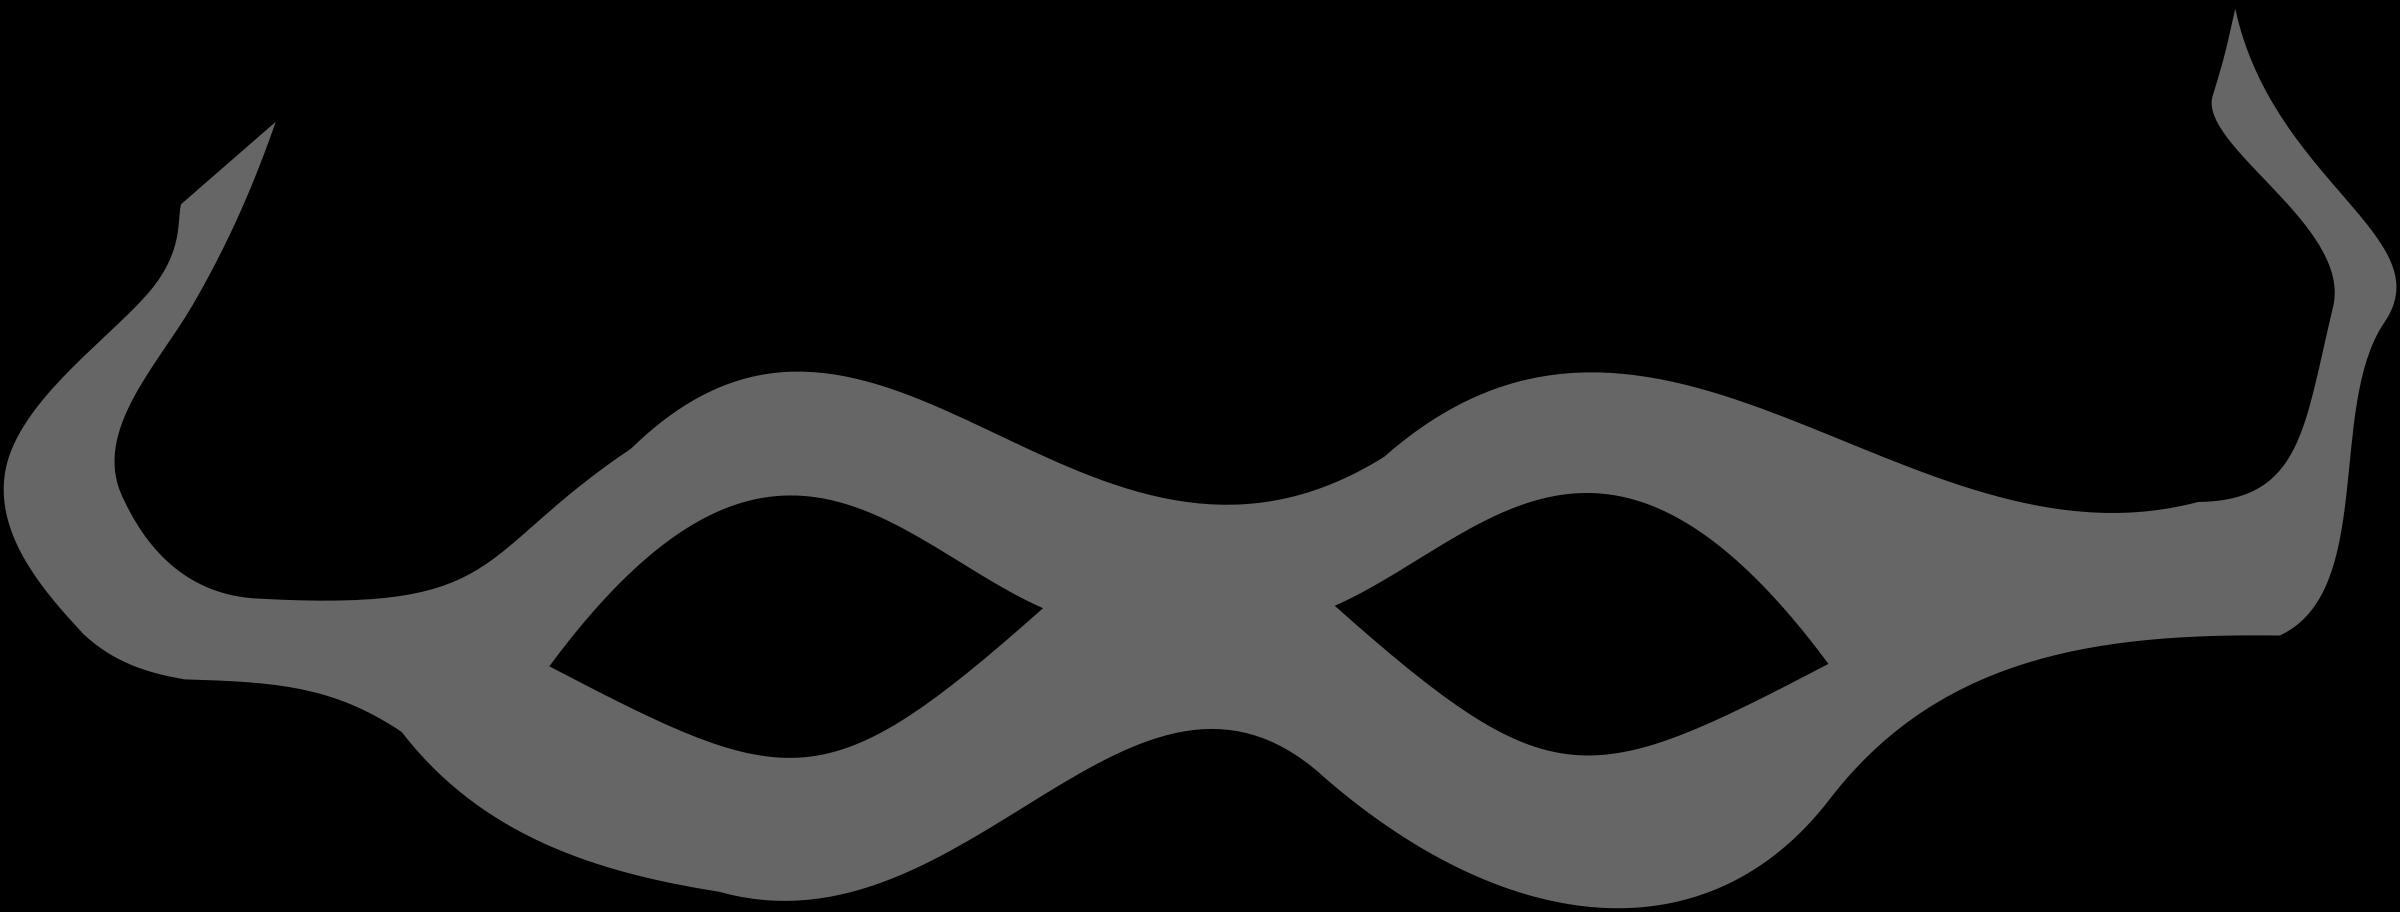 Displaying 19 Images For Cartoon Ninja Mask Free Clip Art Eyes Clipart Clip Art